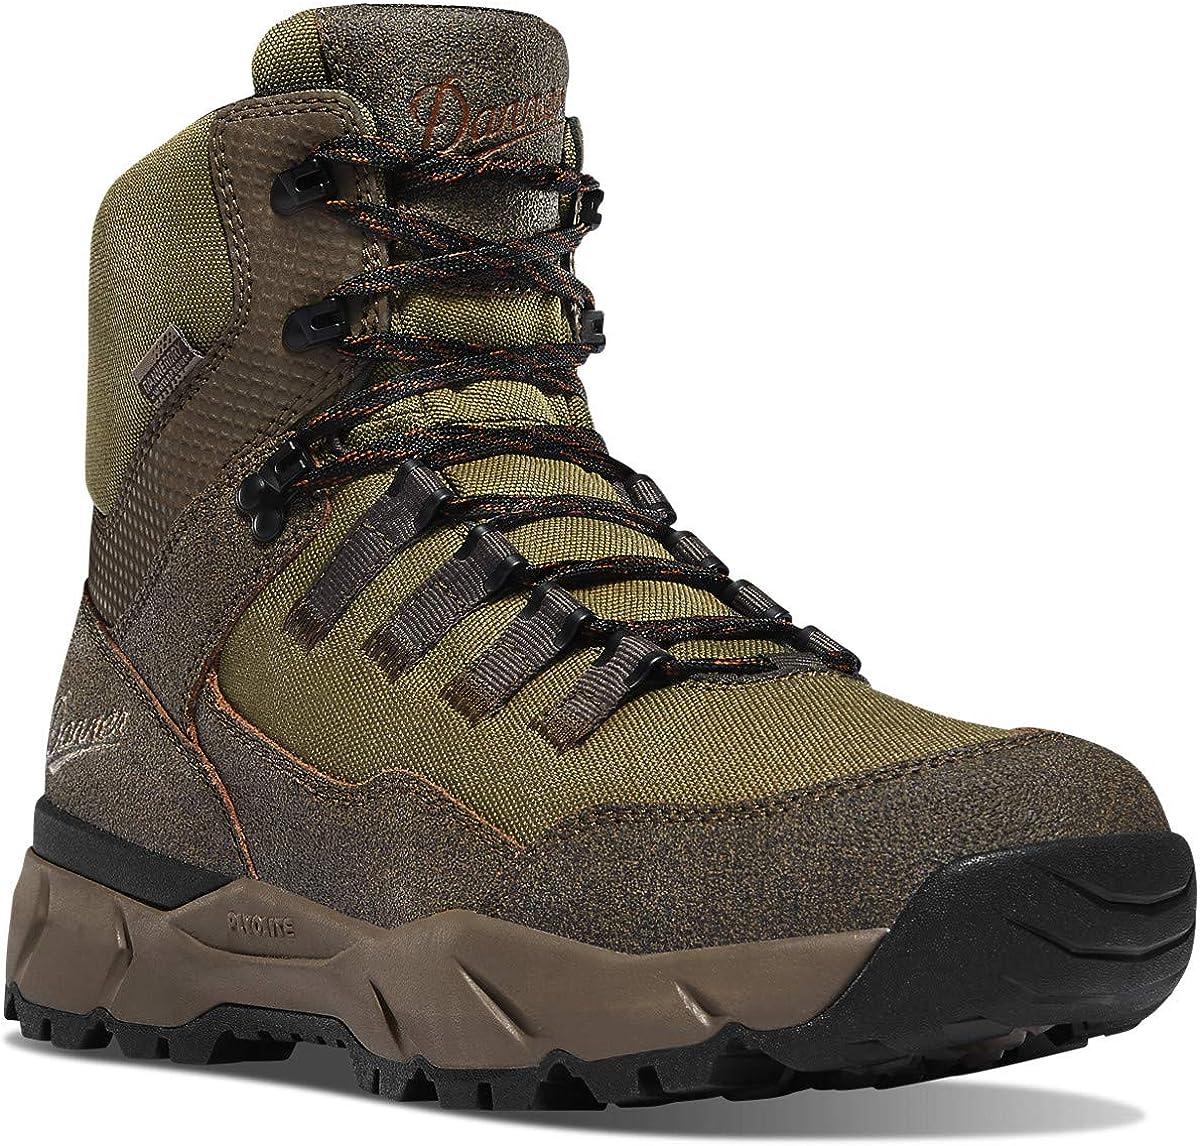 Danner Men's Vital Trail 5 Waterproof Hiking Boot